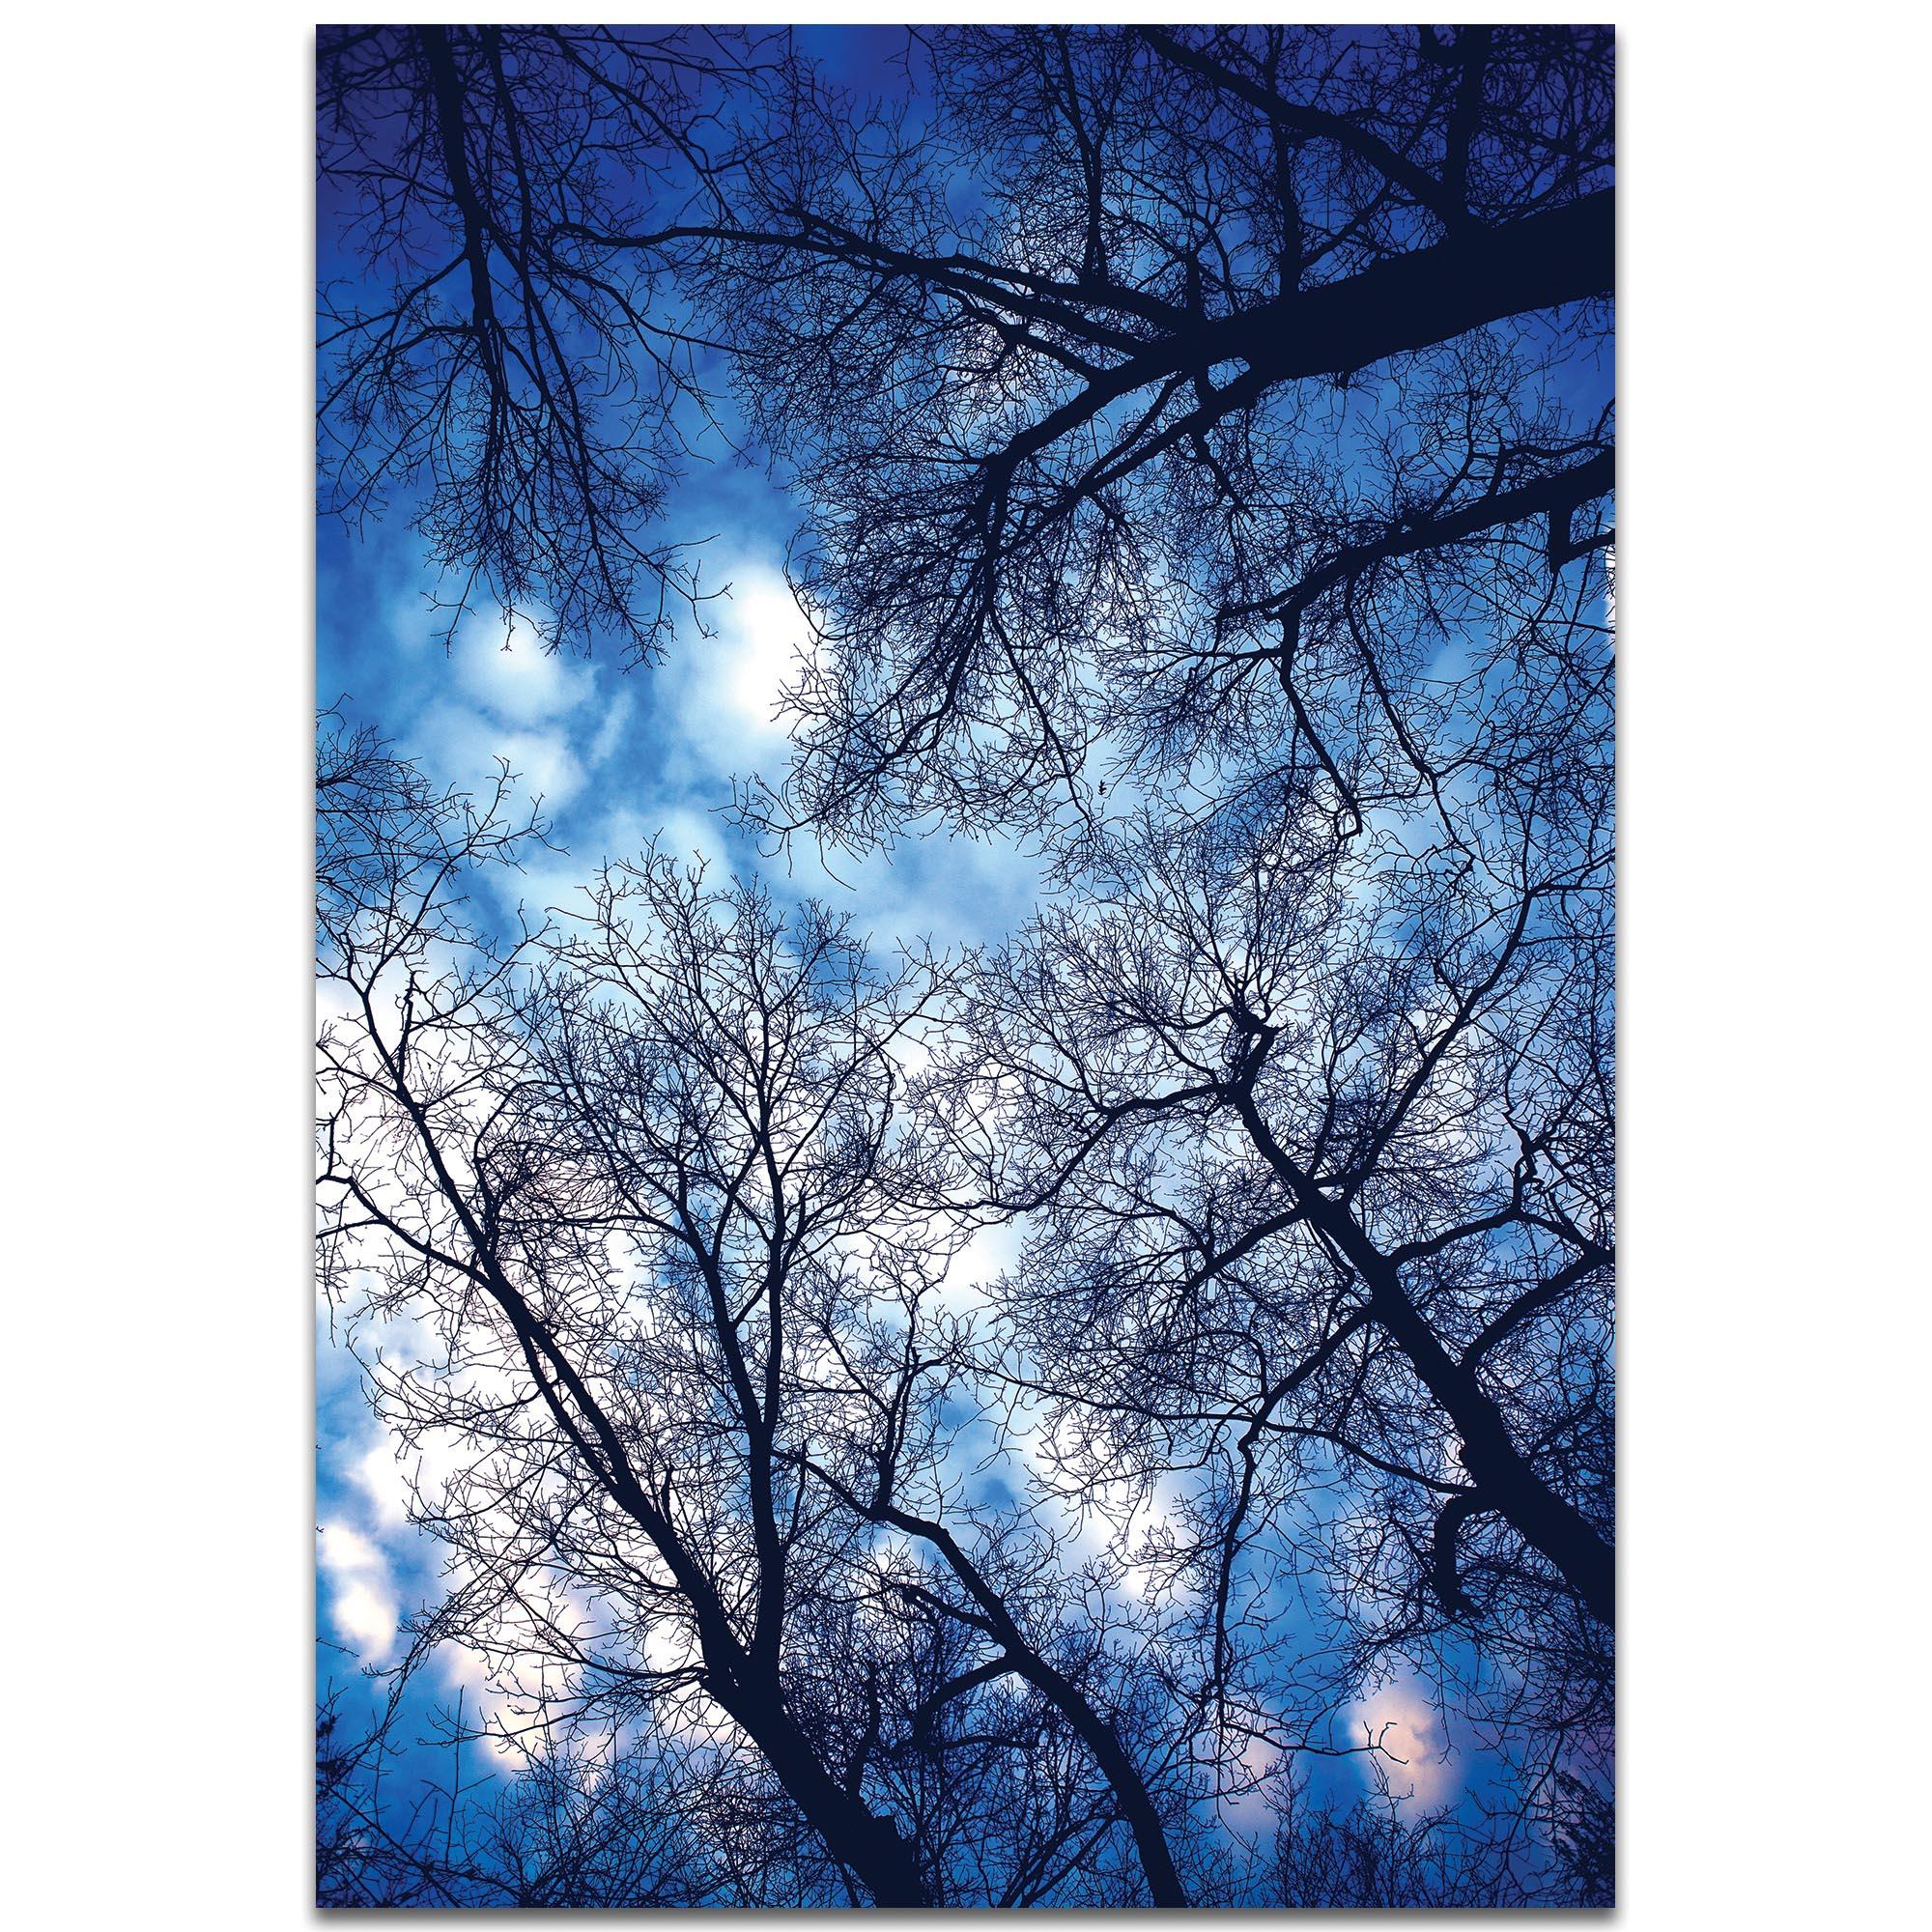 Landscape Photography 'Sky Vains' - Winter Scene Art on Metal or Plexiglass